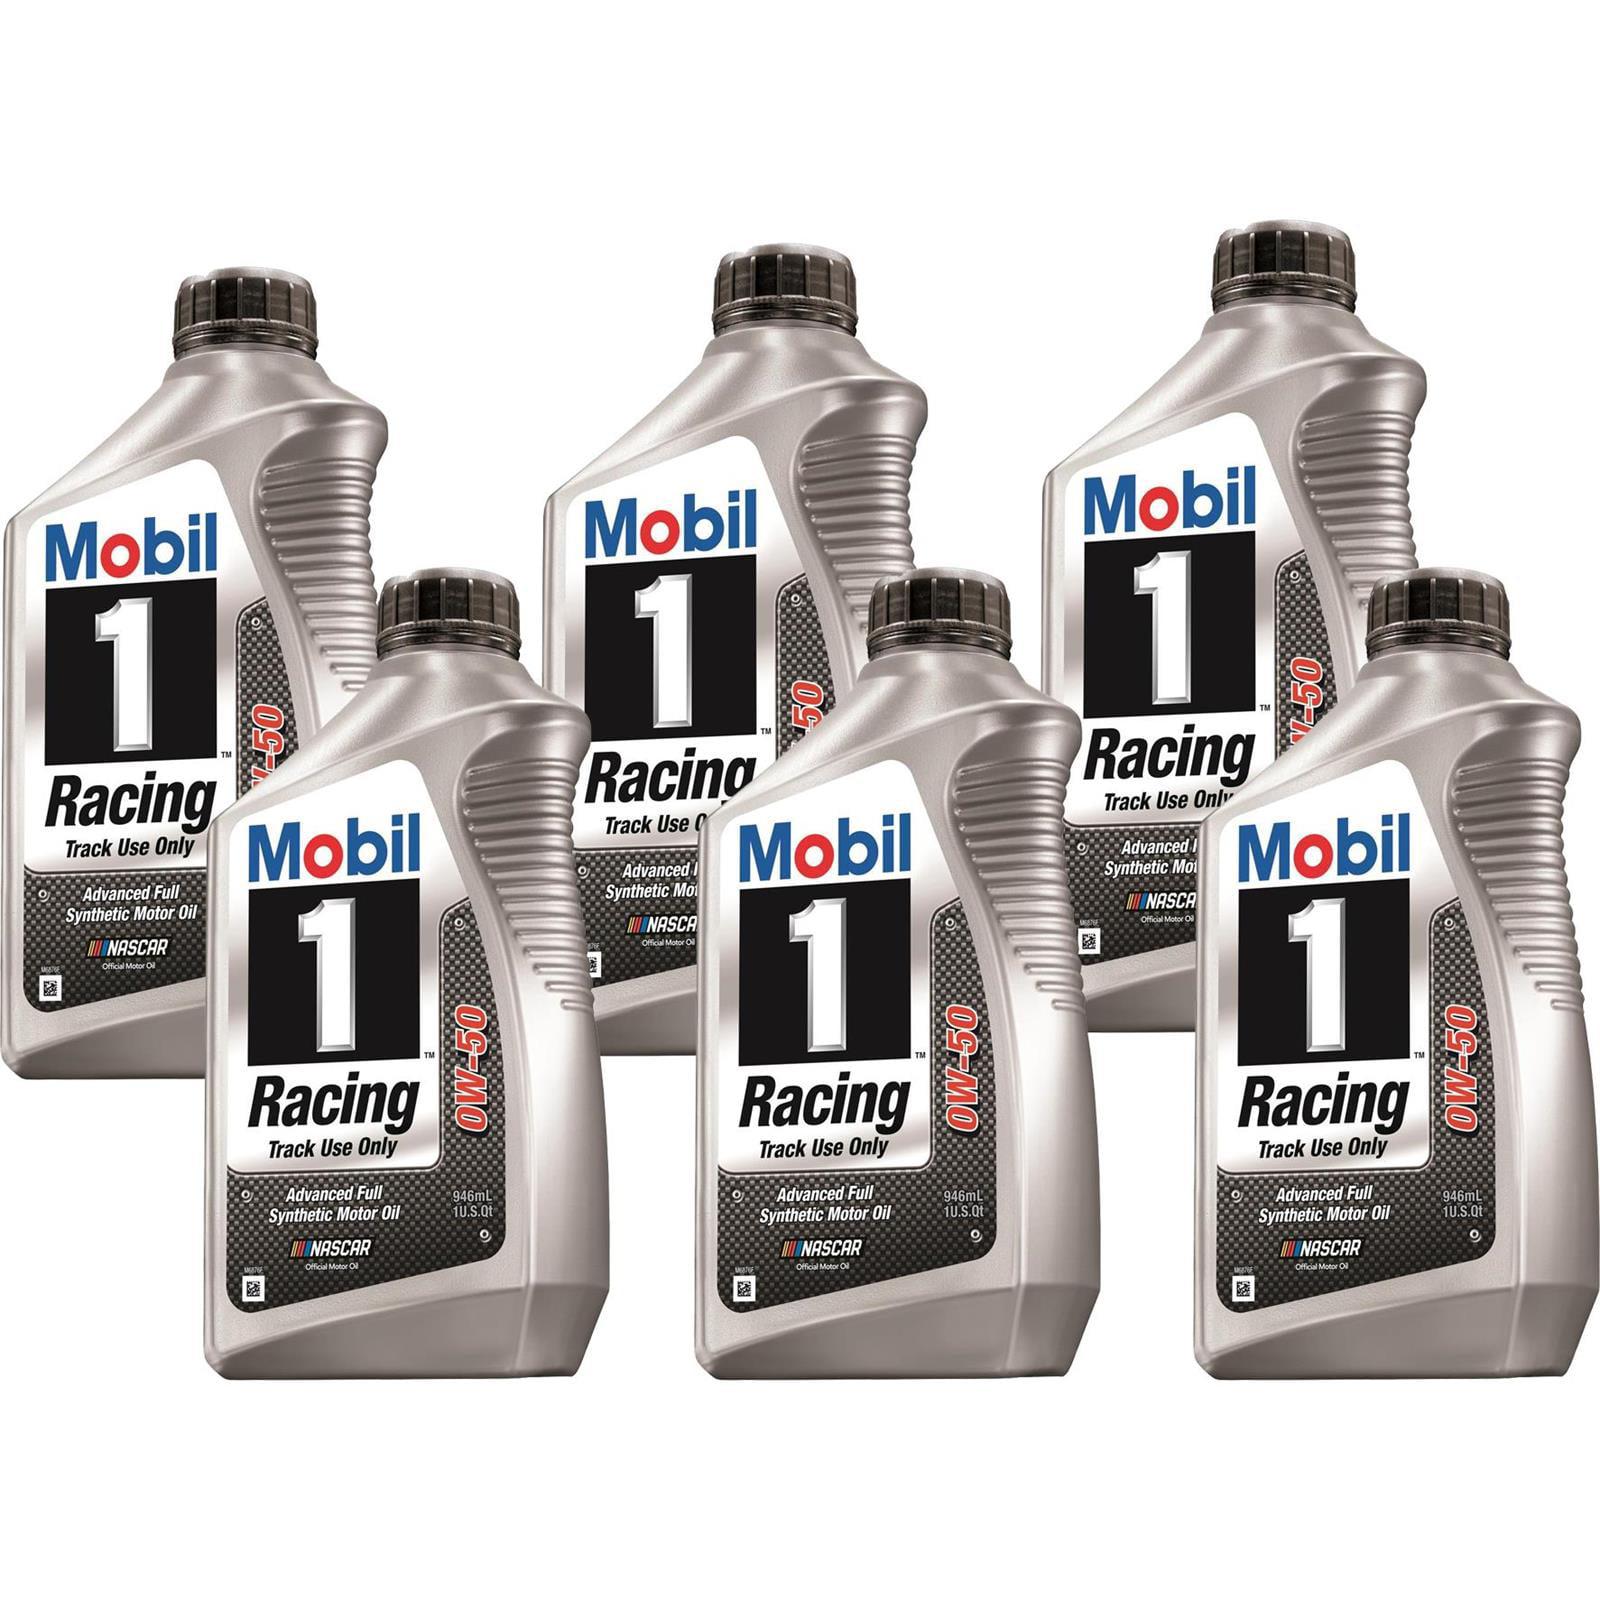 Mobil1 104145 Racing Engine Oil, 0W-50, 6 Quarts